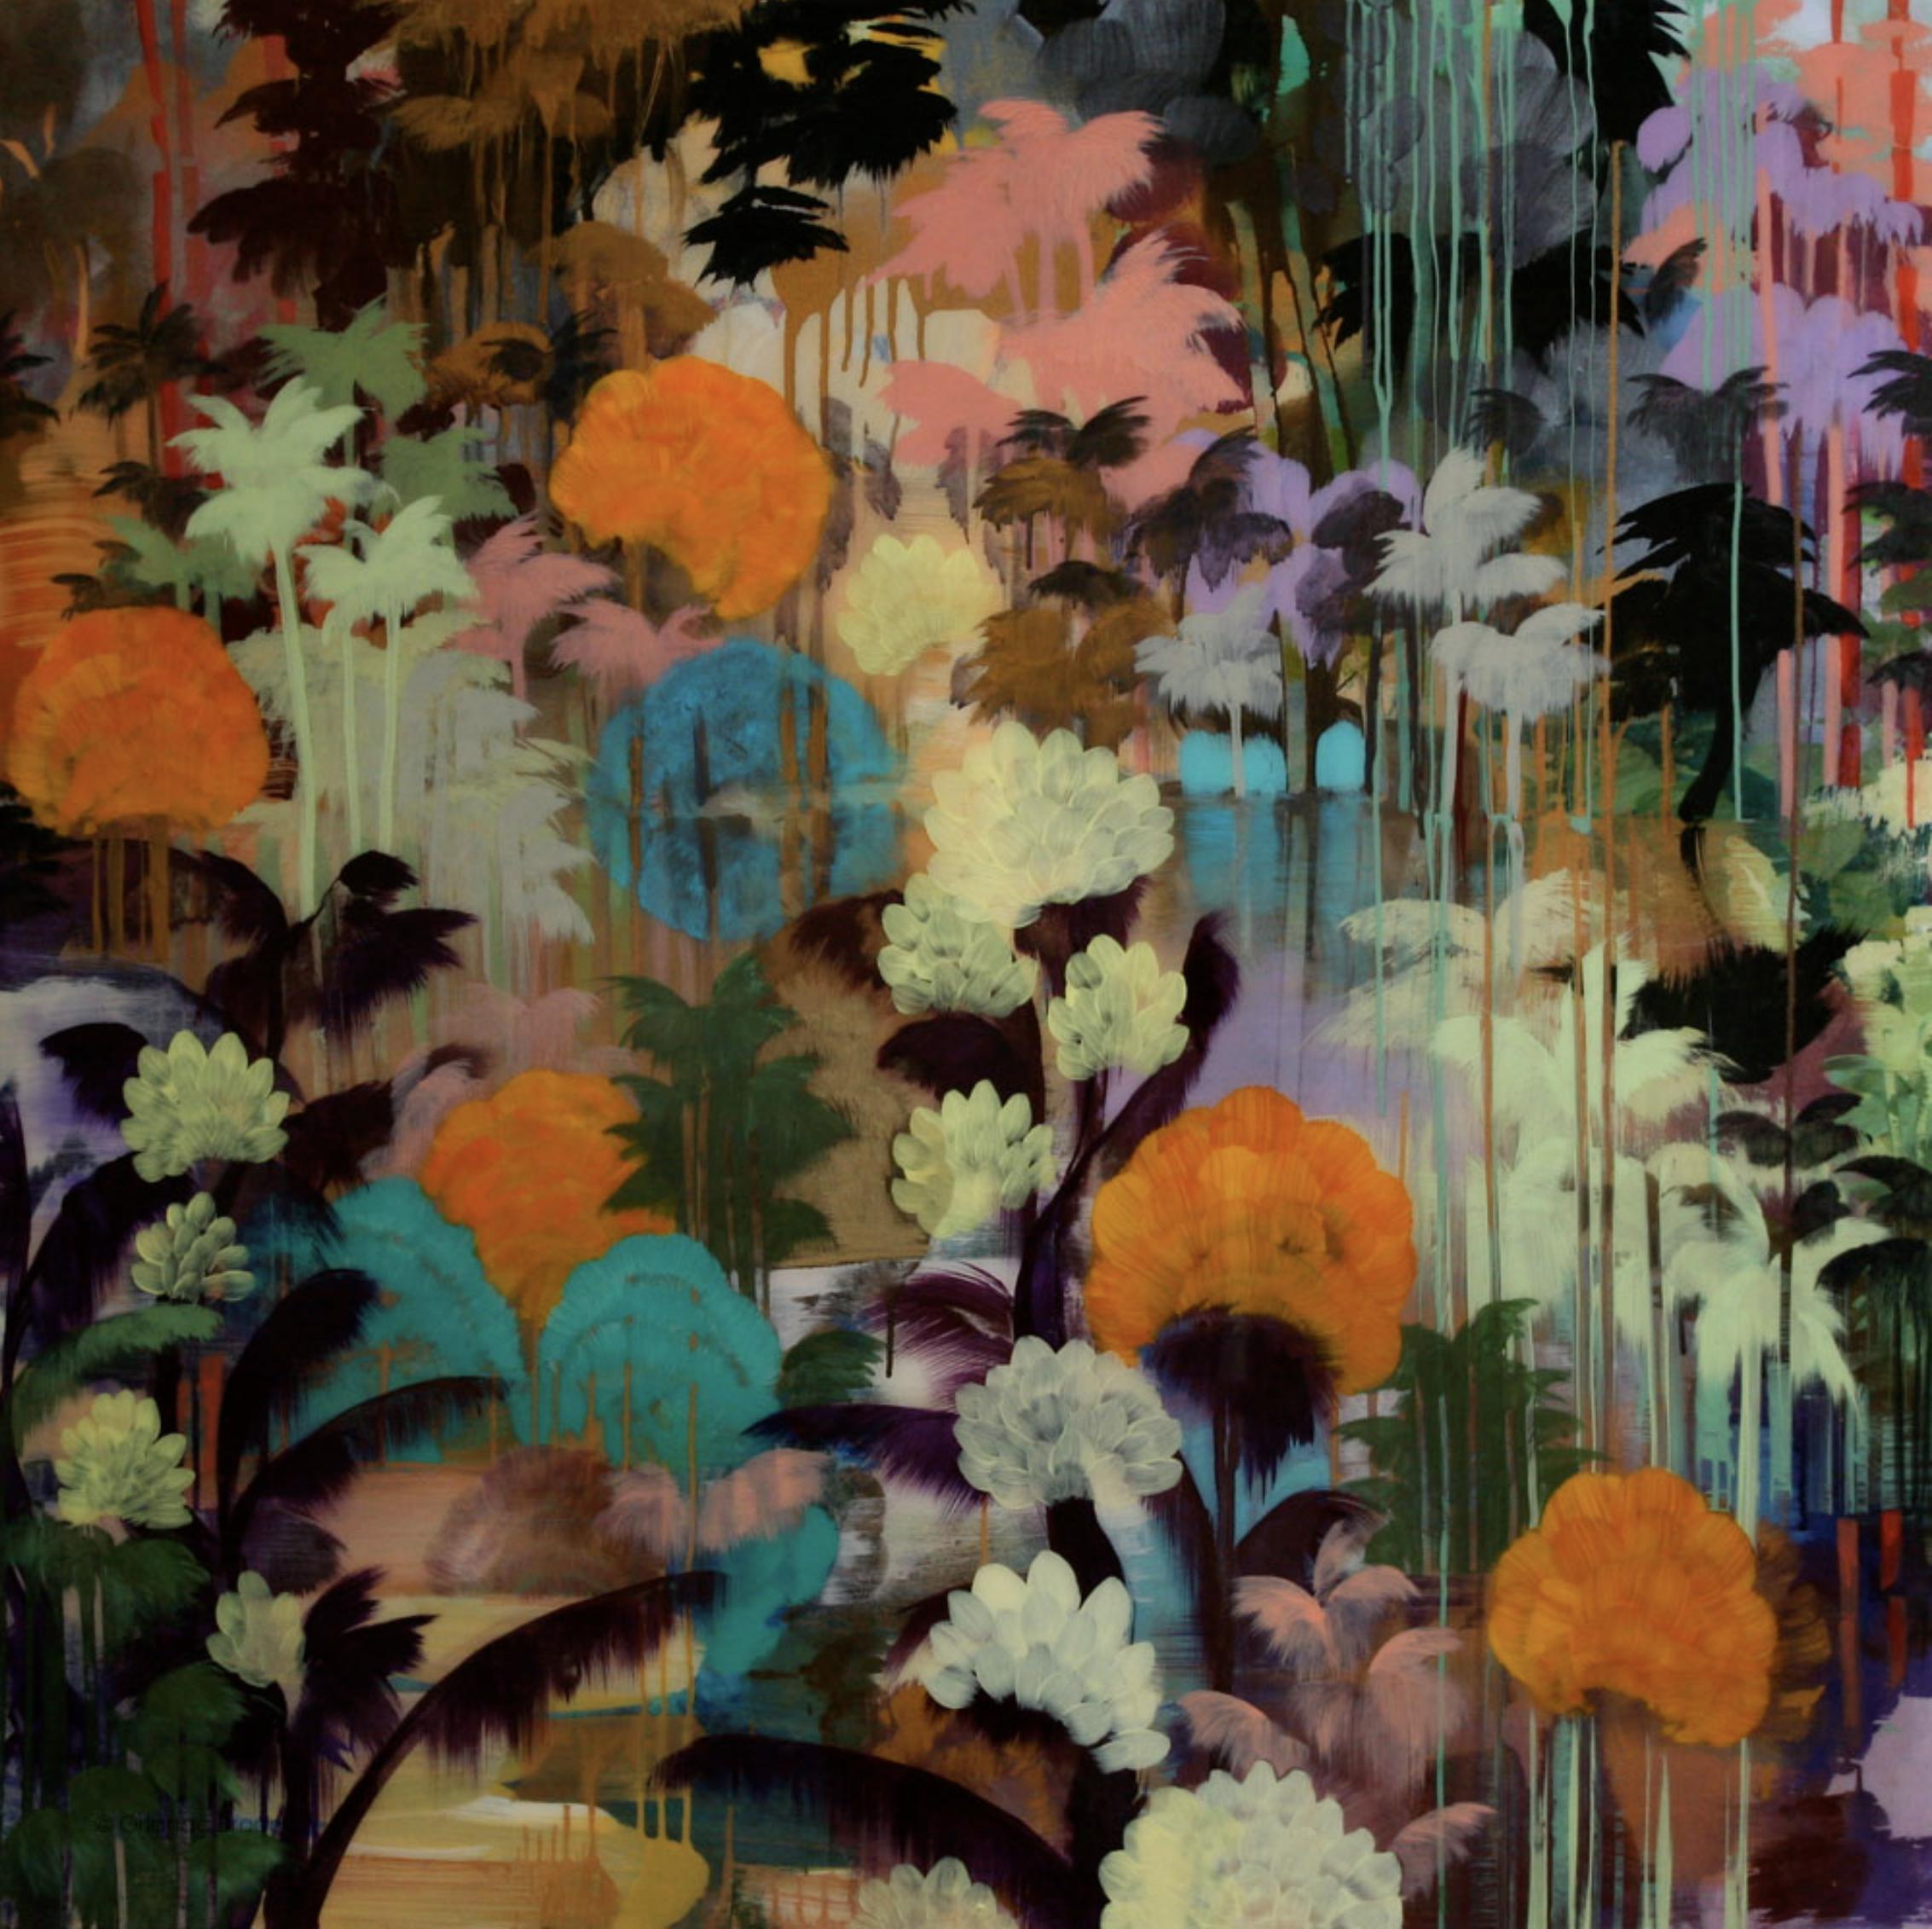 Artwork by Orlanda Broom